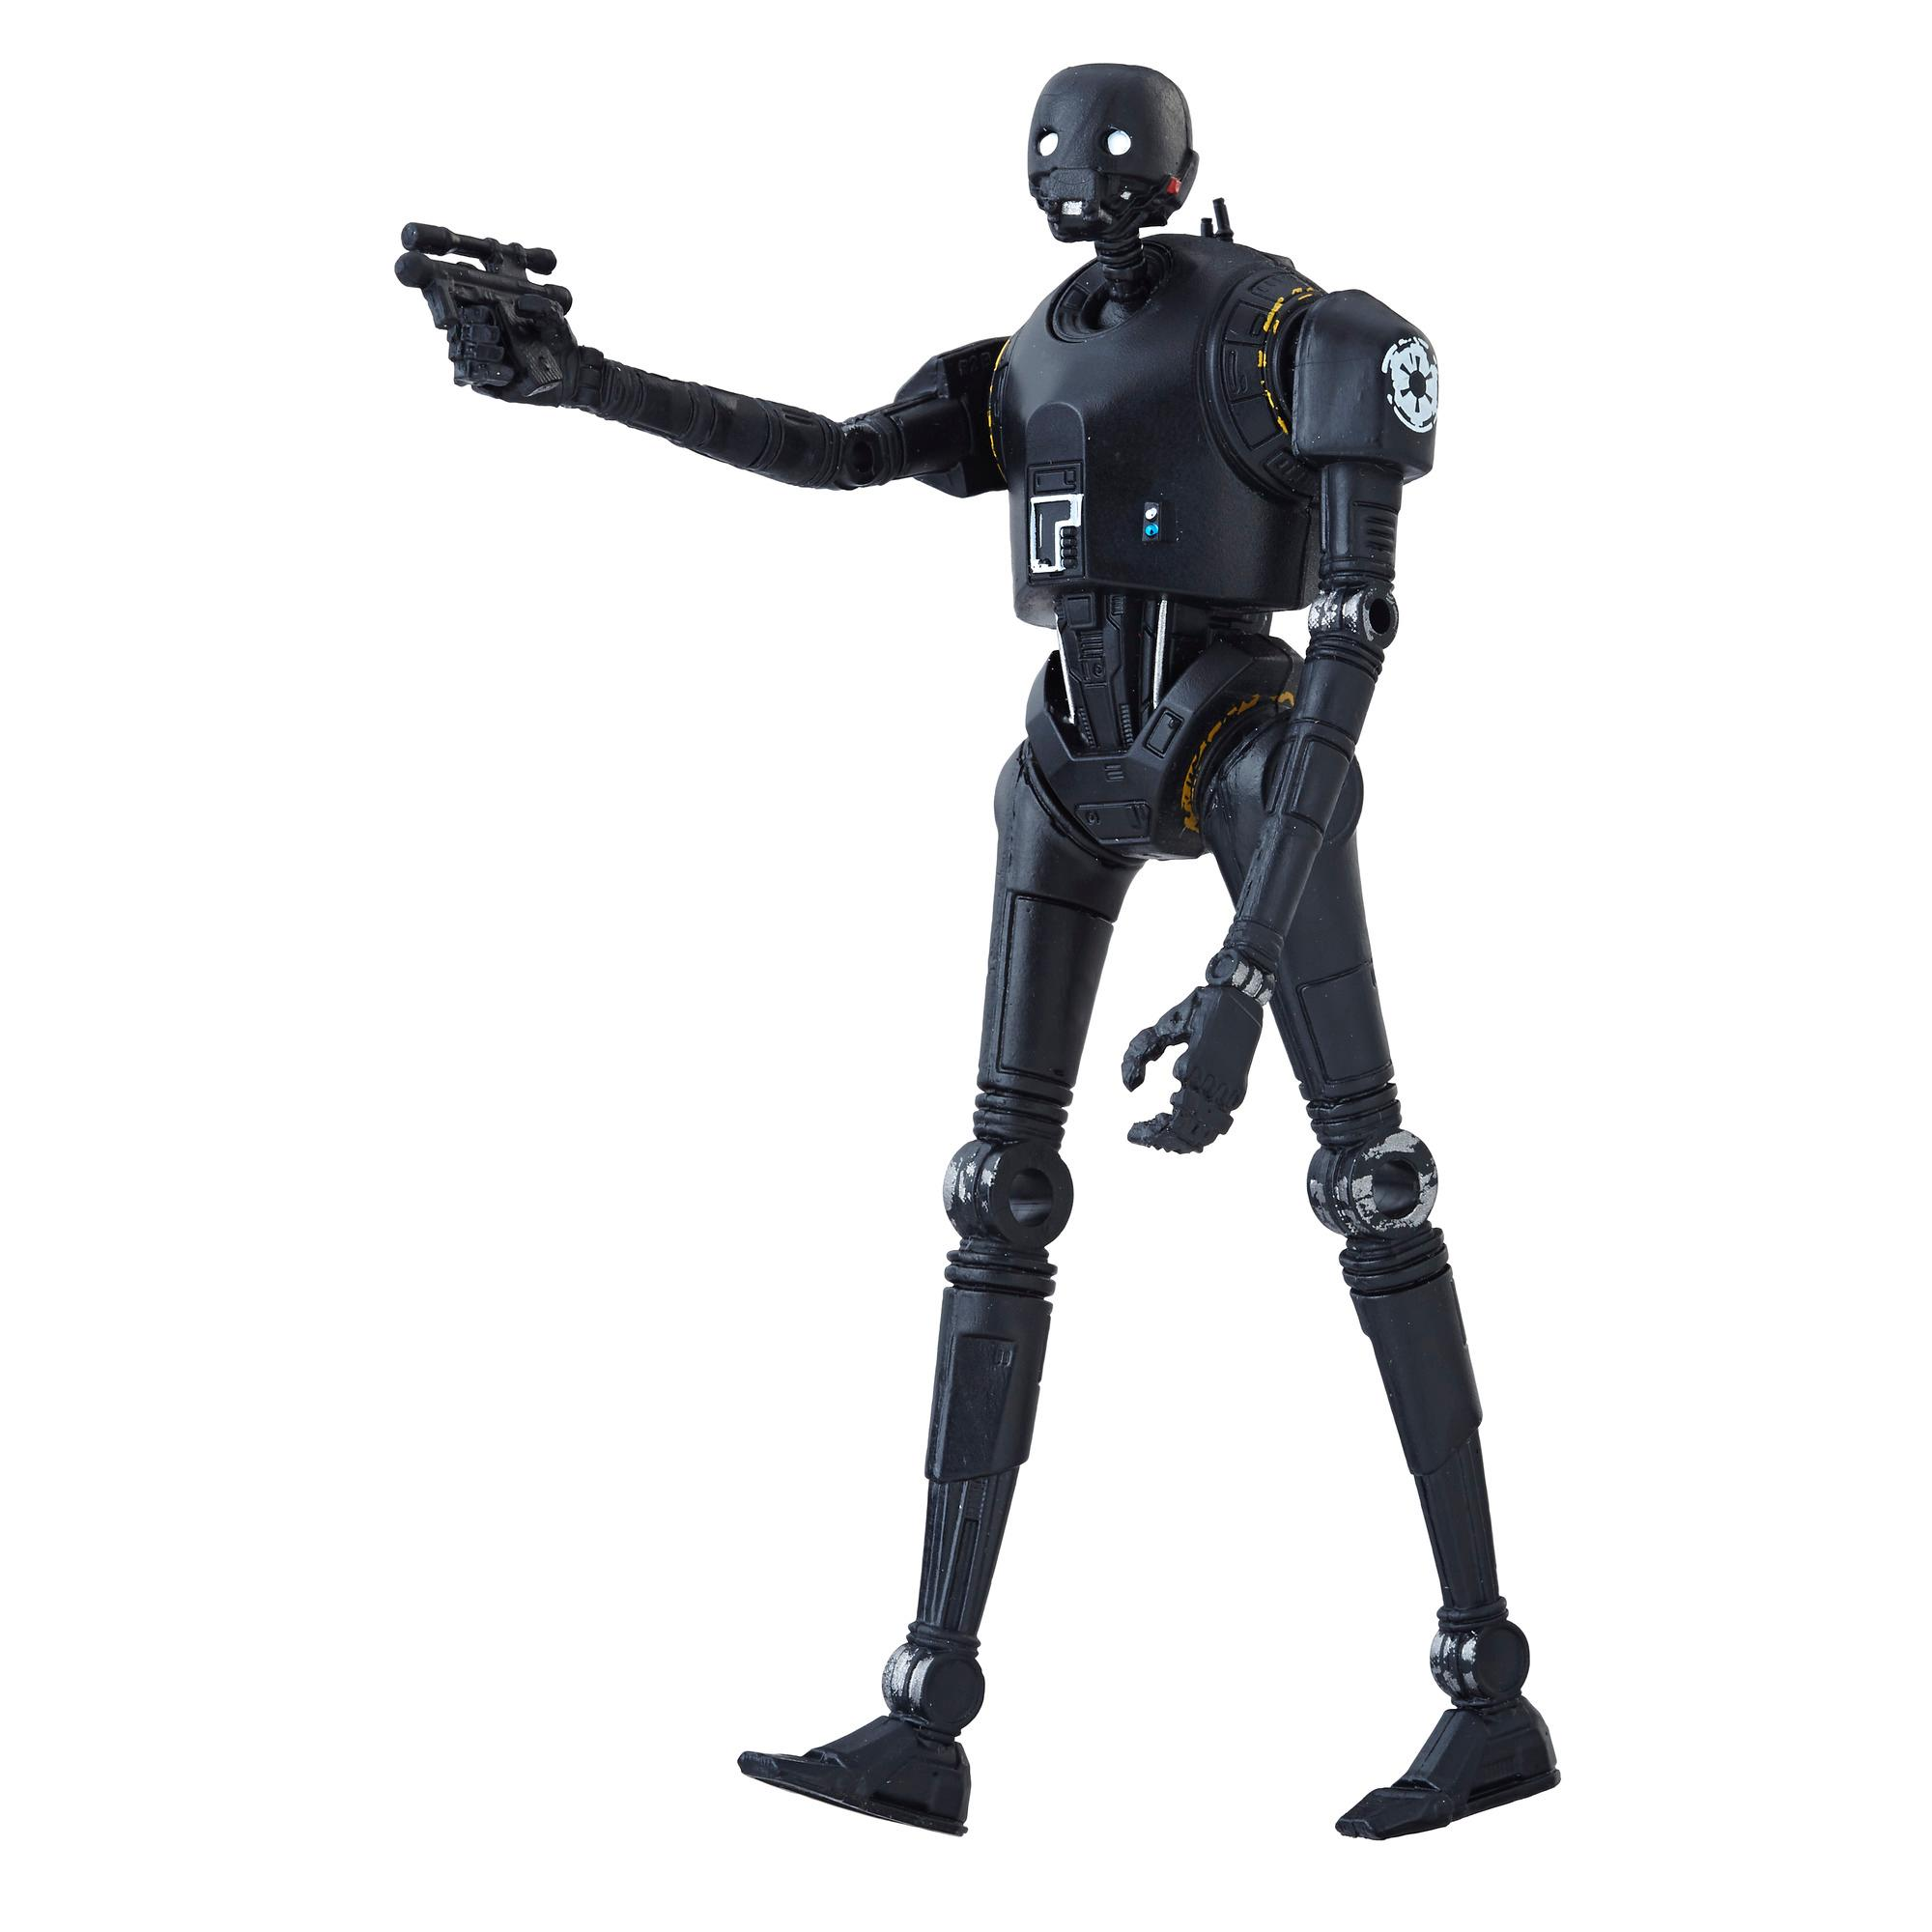 Star Wars Force Link 2.0 - Figurine K-2SO (Ka-Deuesso)